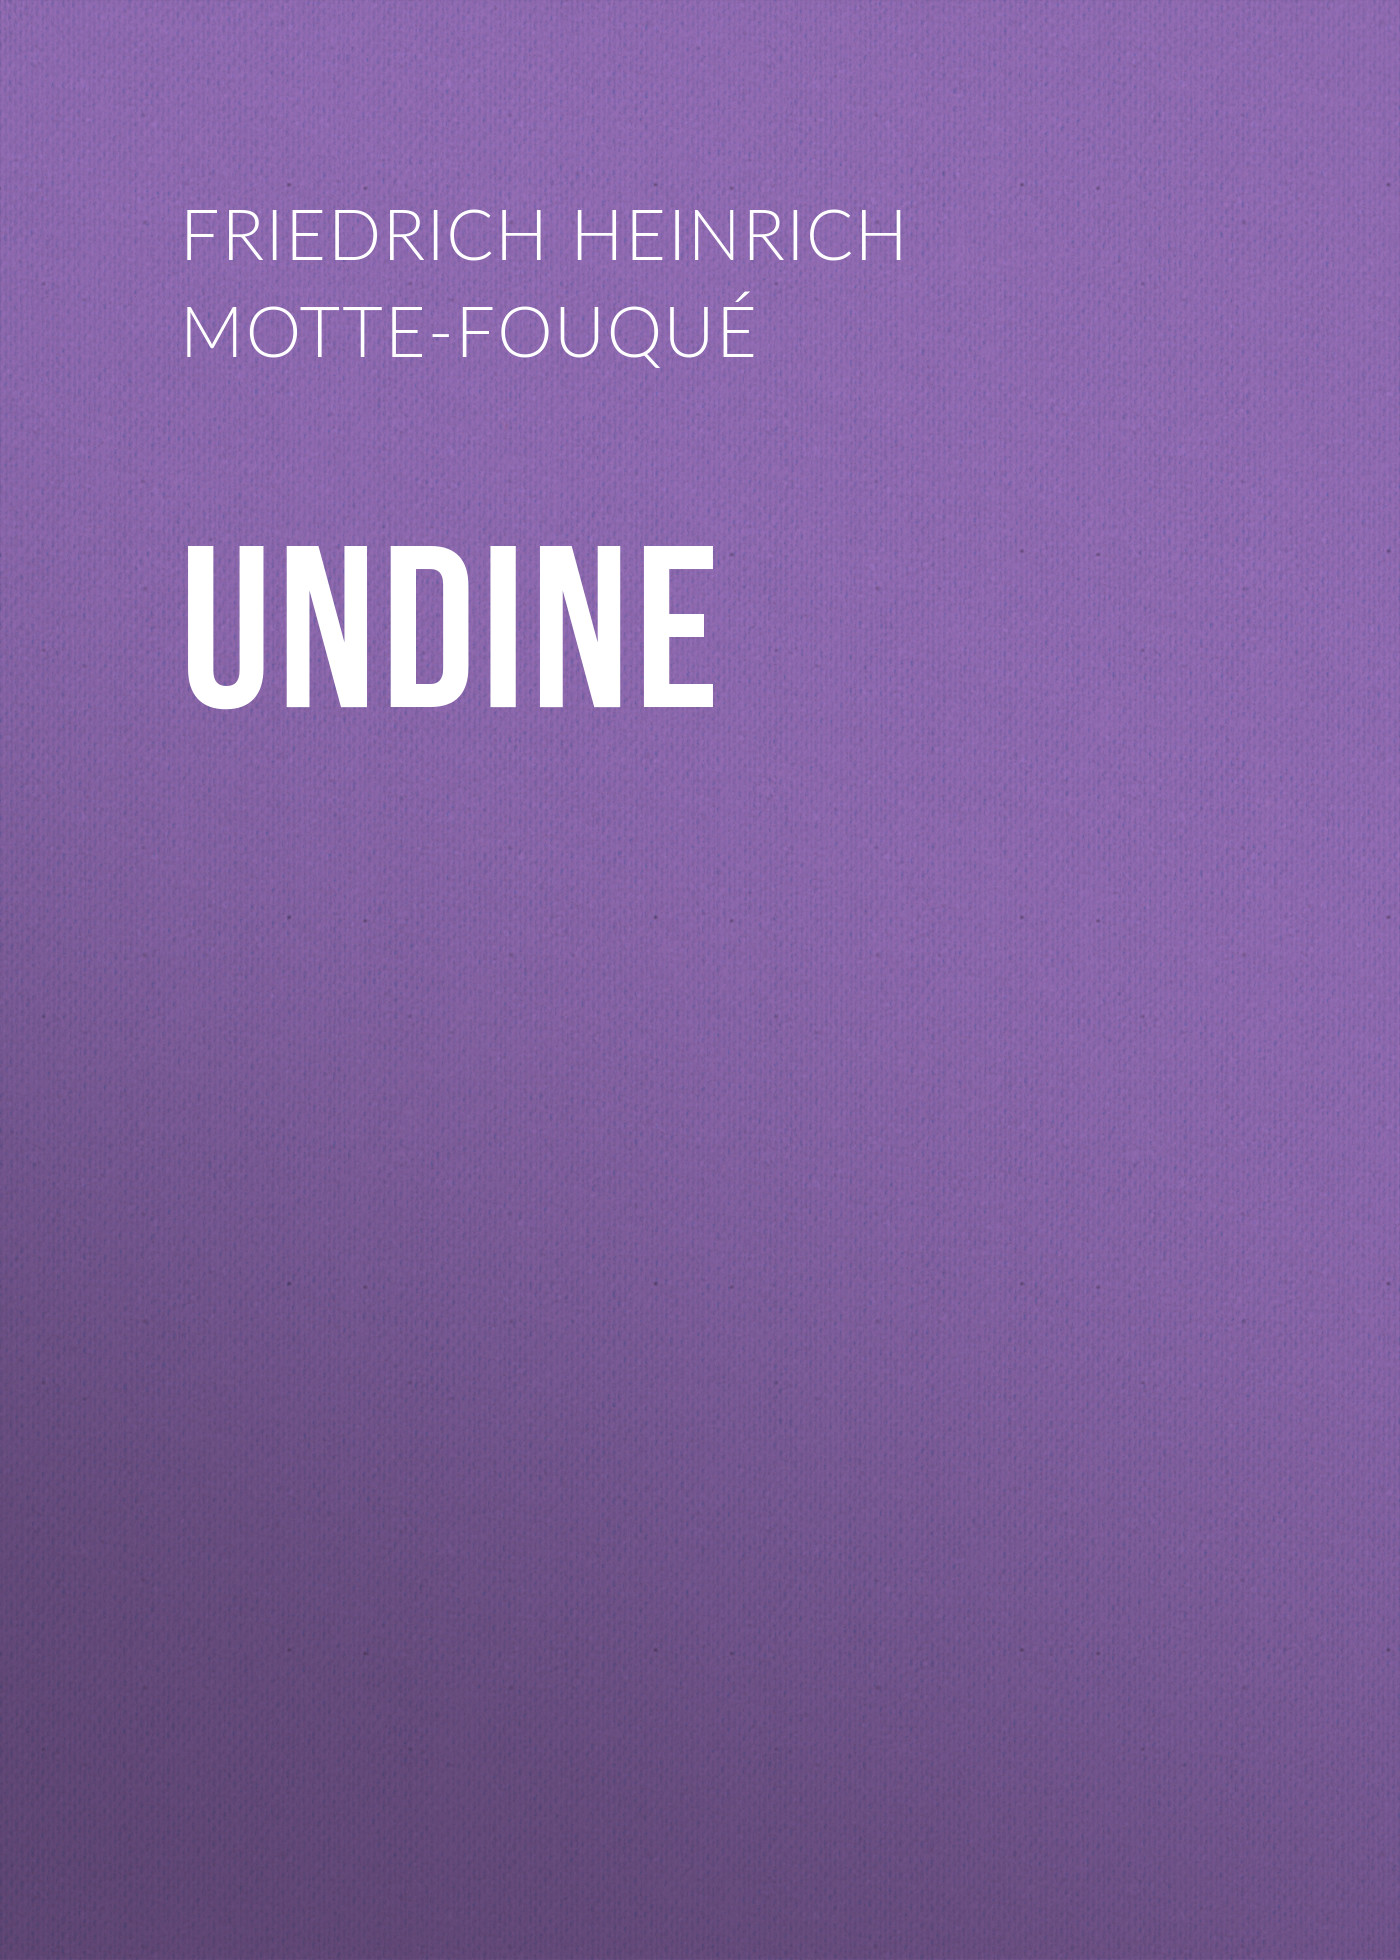 Friedrich Heinrich Karl de La Motte-Fouqué Undine